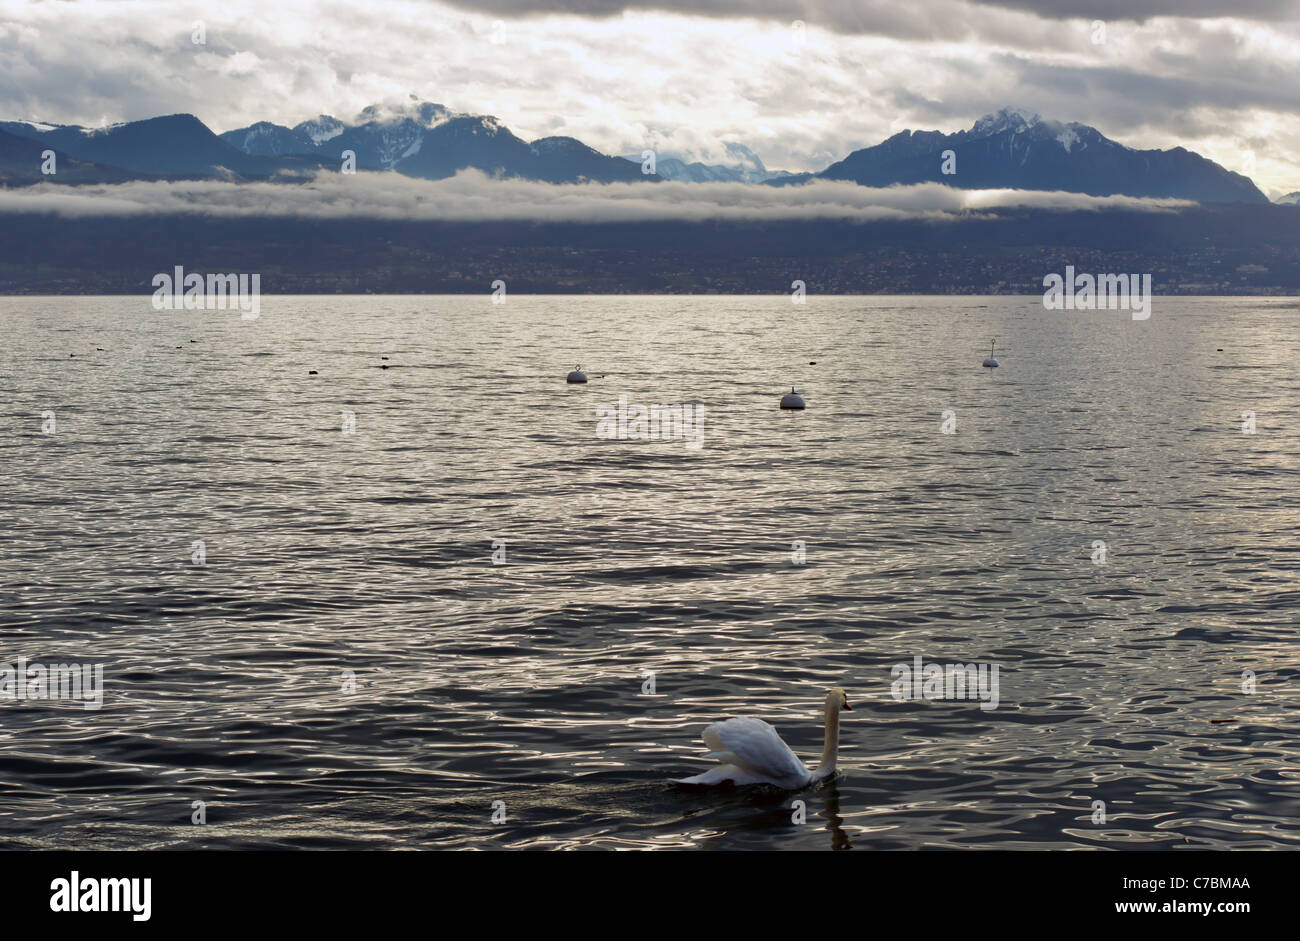 Swan on Lac Leman (Geneva Lake) Lausanne, Switzerland - Stock Image